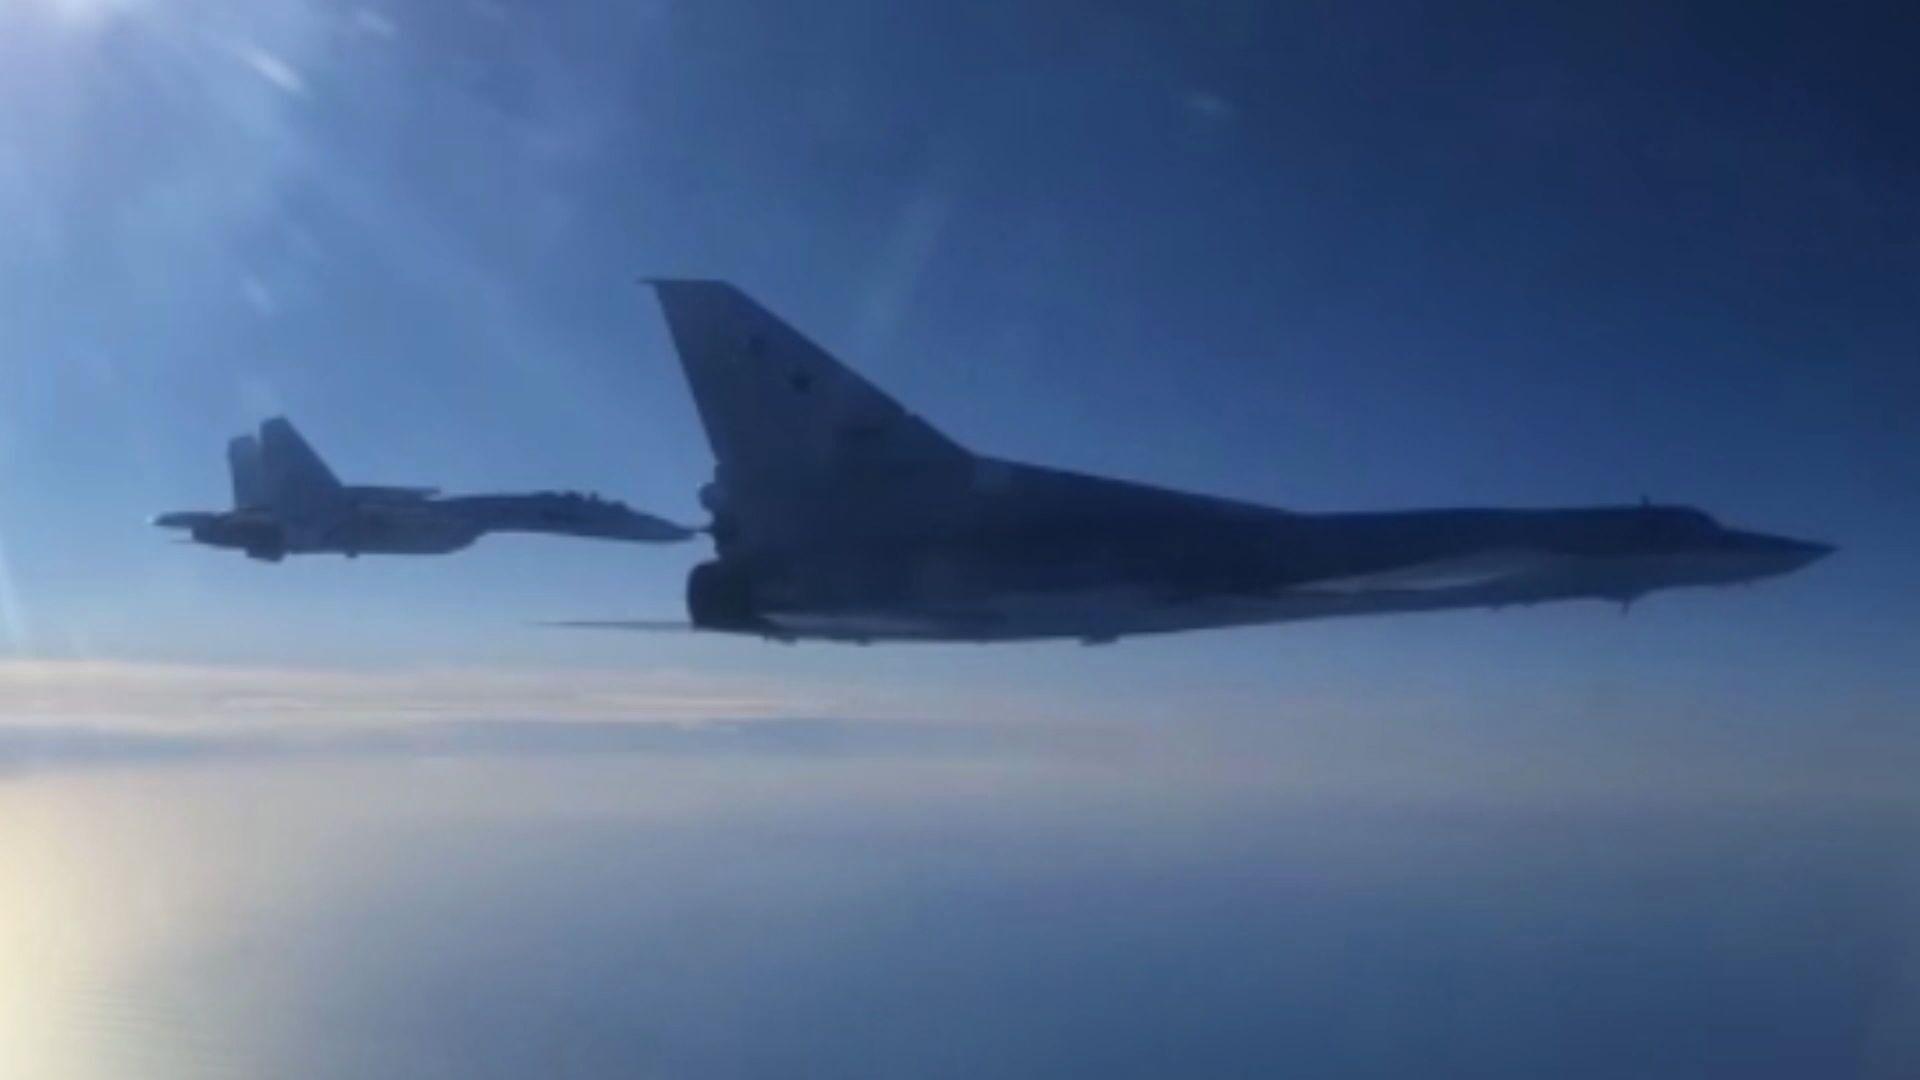 Rosyjskie bombowce Tu-22M3 - Sputnik Polska, 1920, 21.09.2021